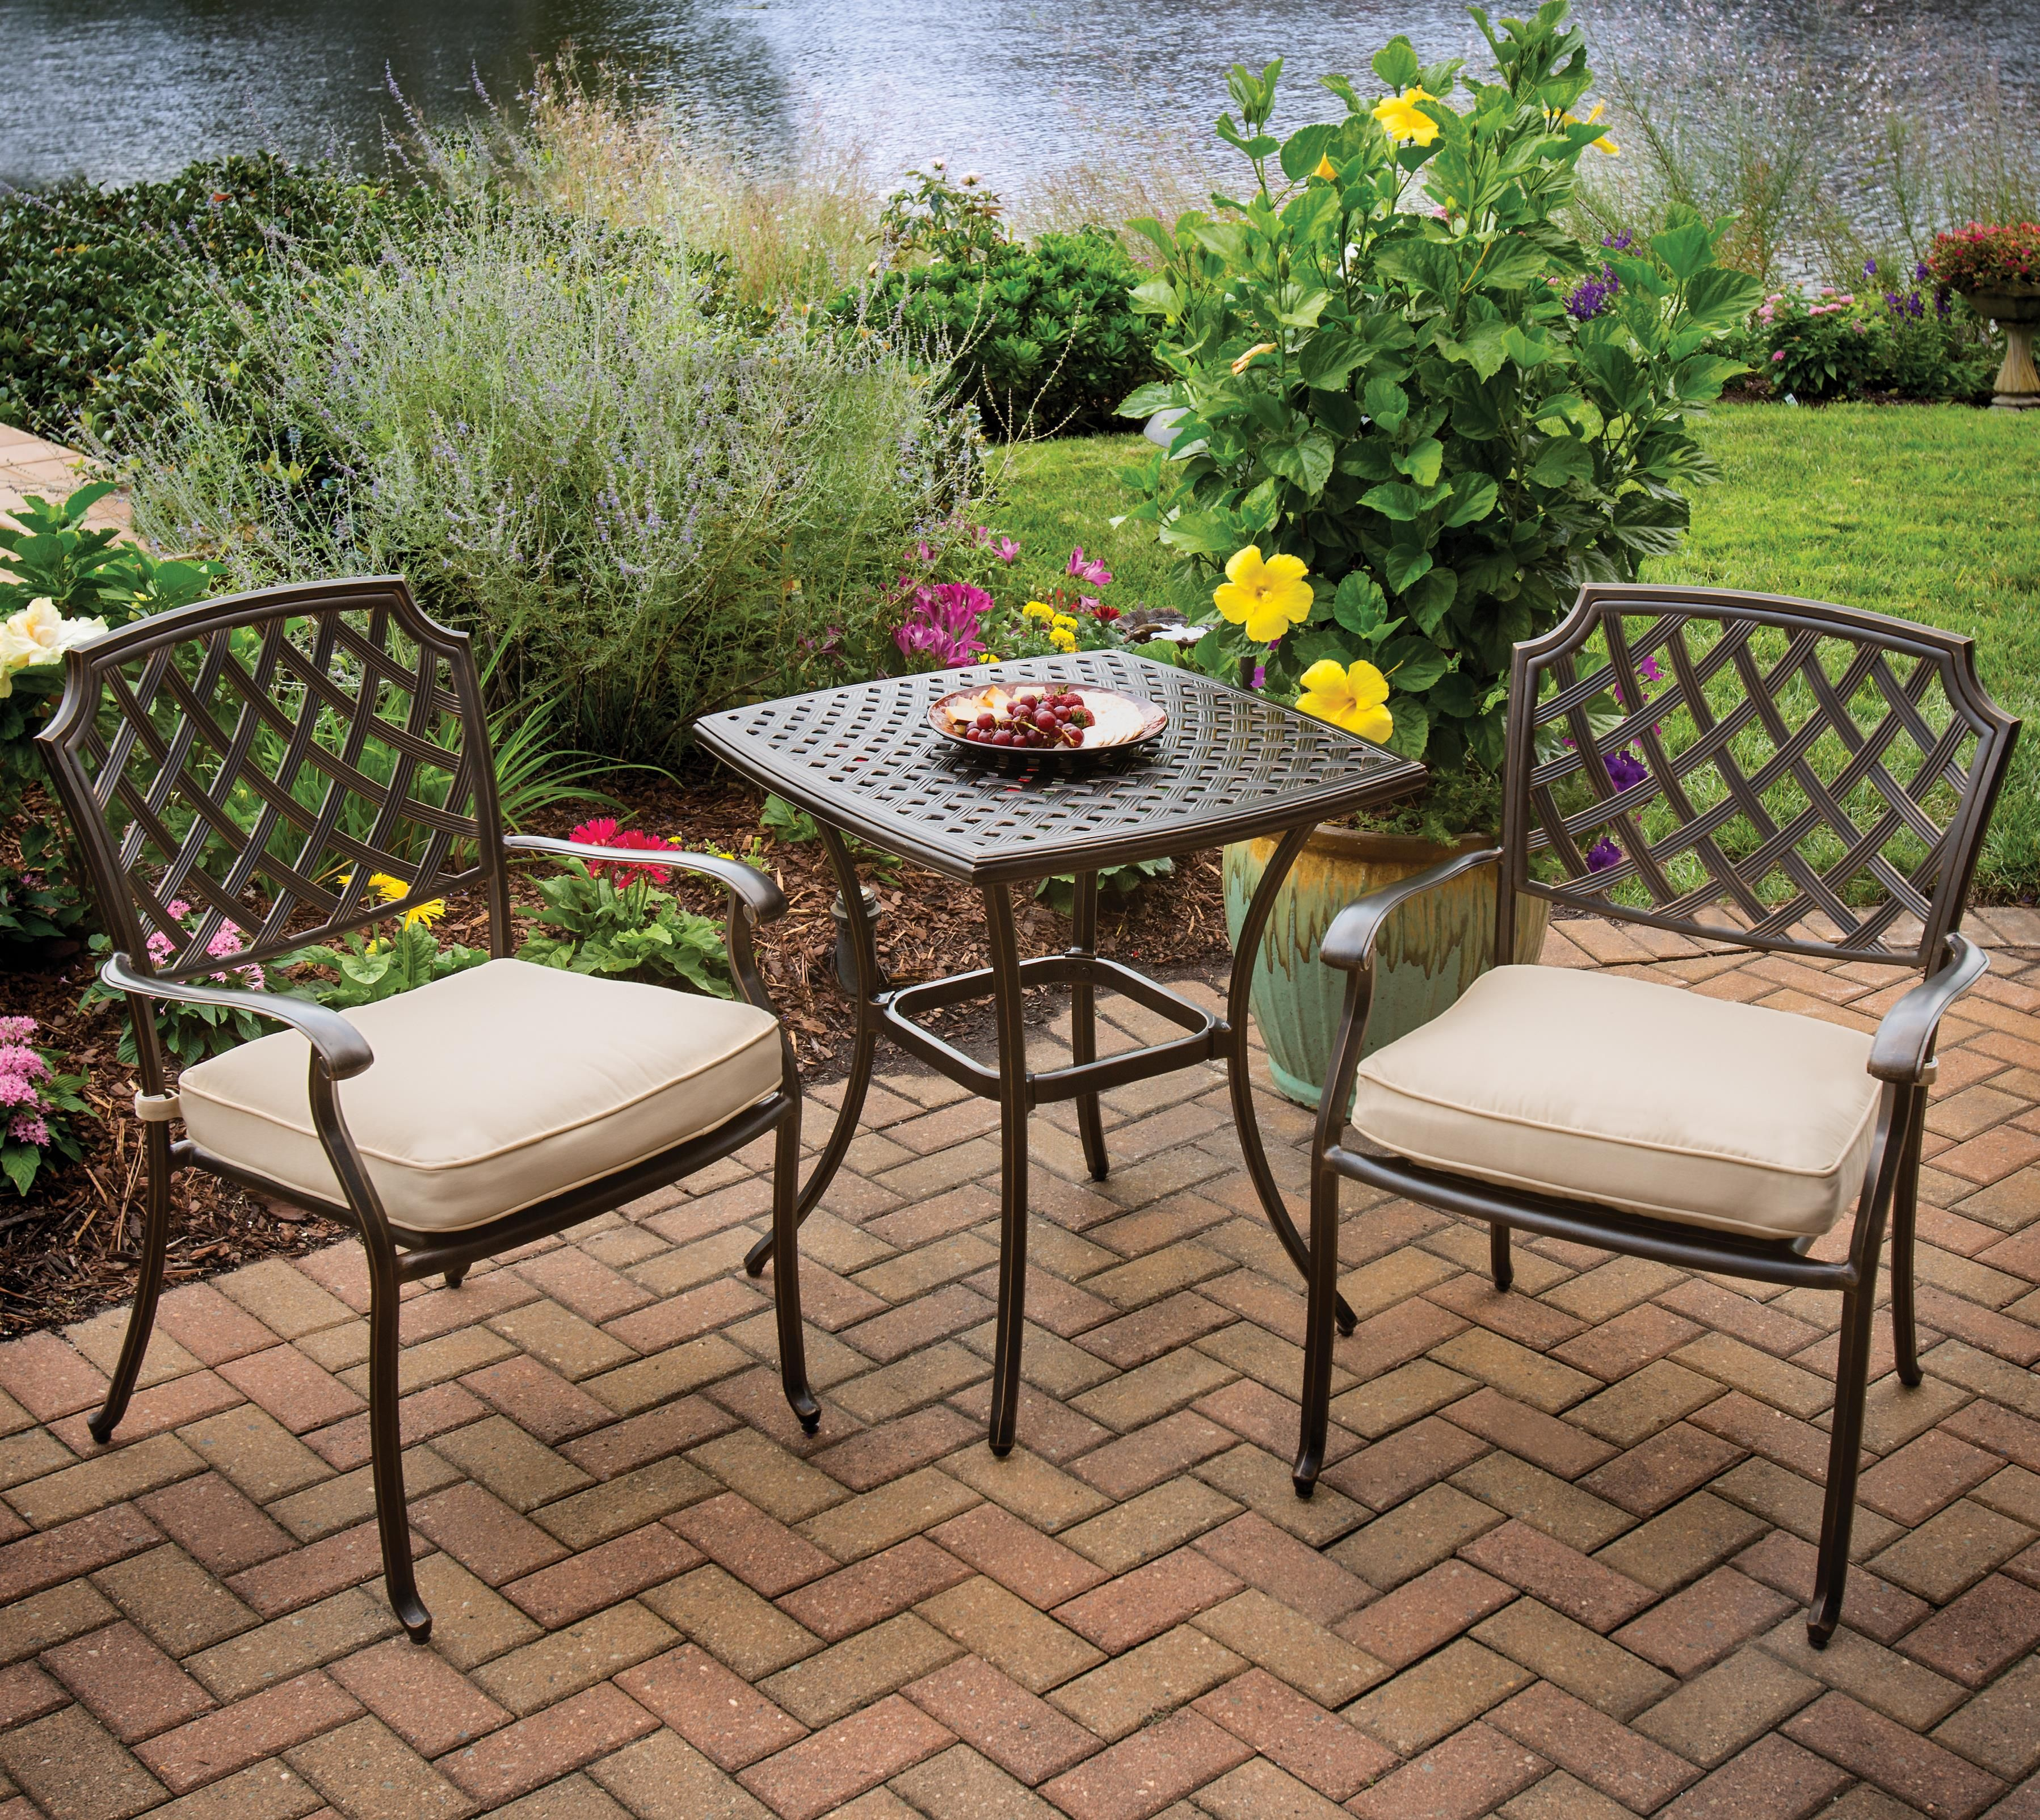 Admirable Heritage Bistro Set By Agio Conlins Furniture Furniture Ibusinesslaw Wood Chair Design Ideas Ibusinesslaworg